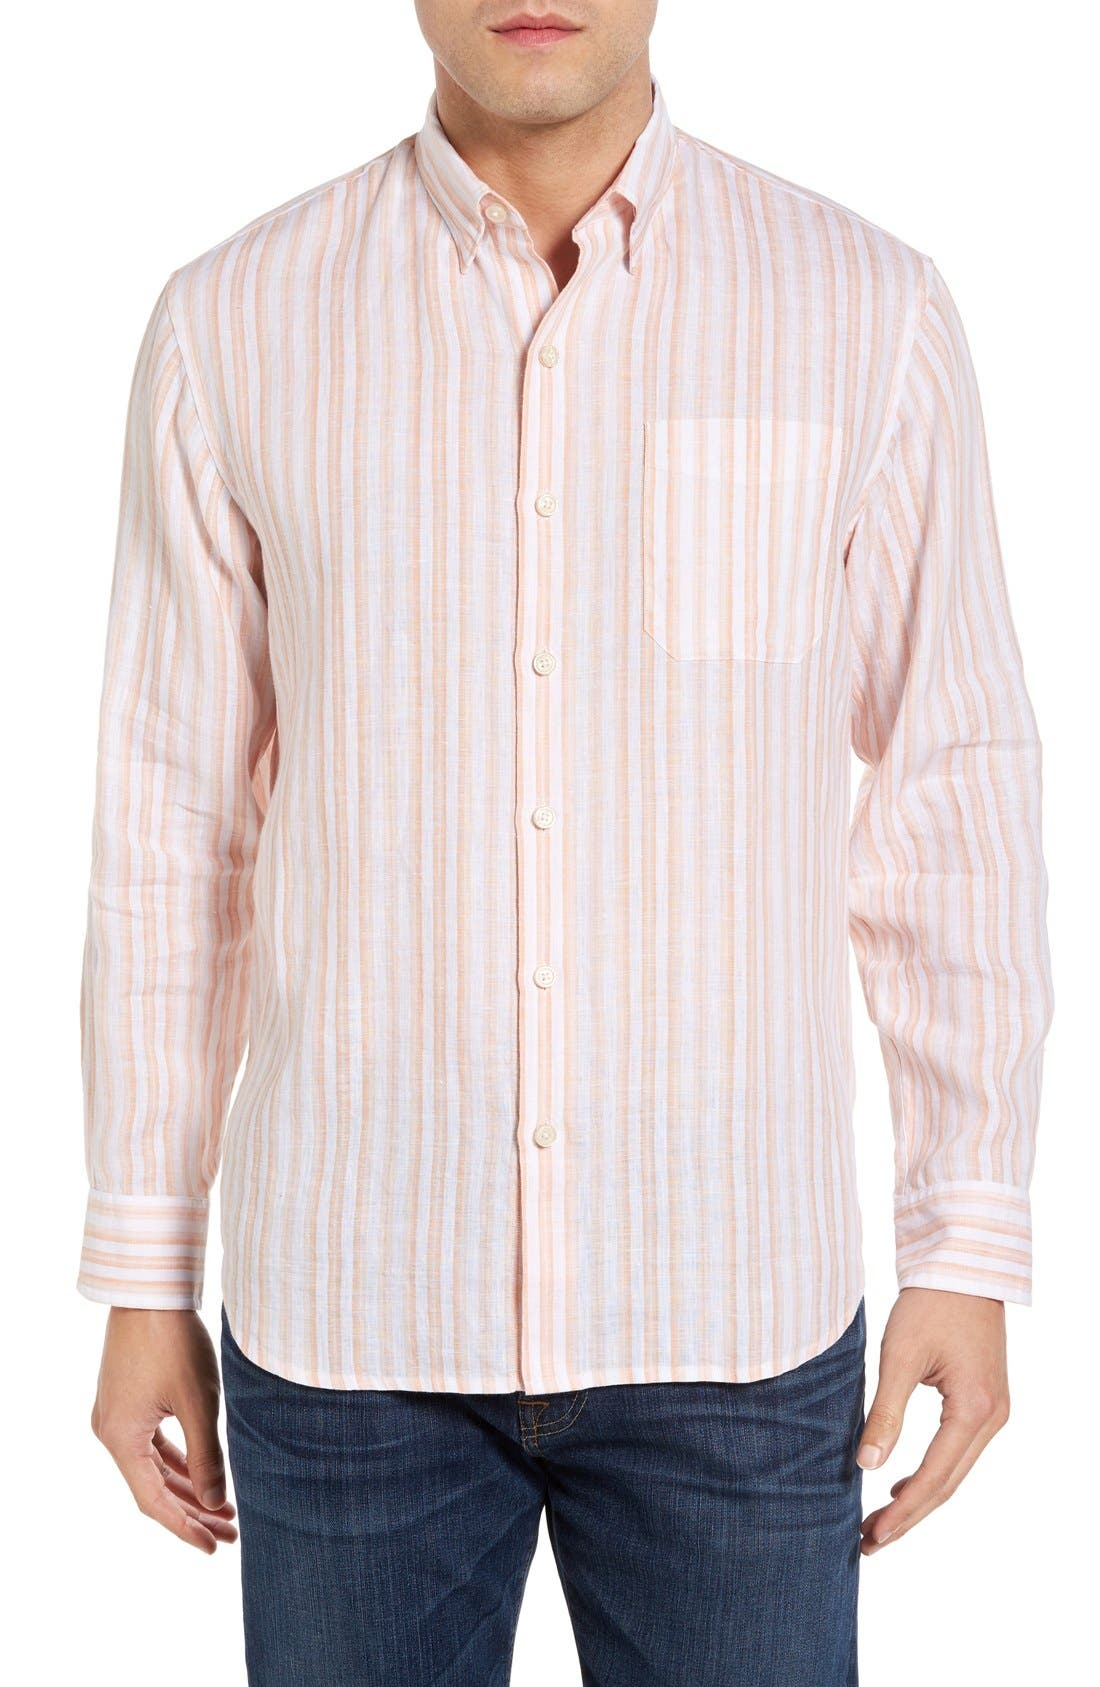 Tommy Bahama Pintado Stripe Linen Sport Shirt (Big & Tall)